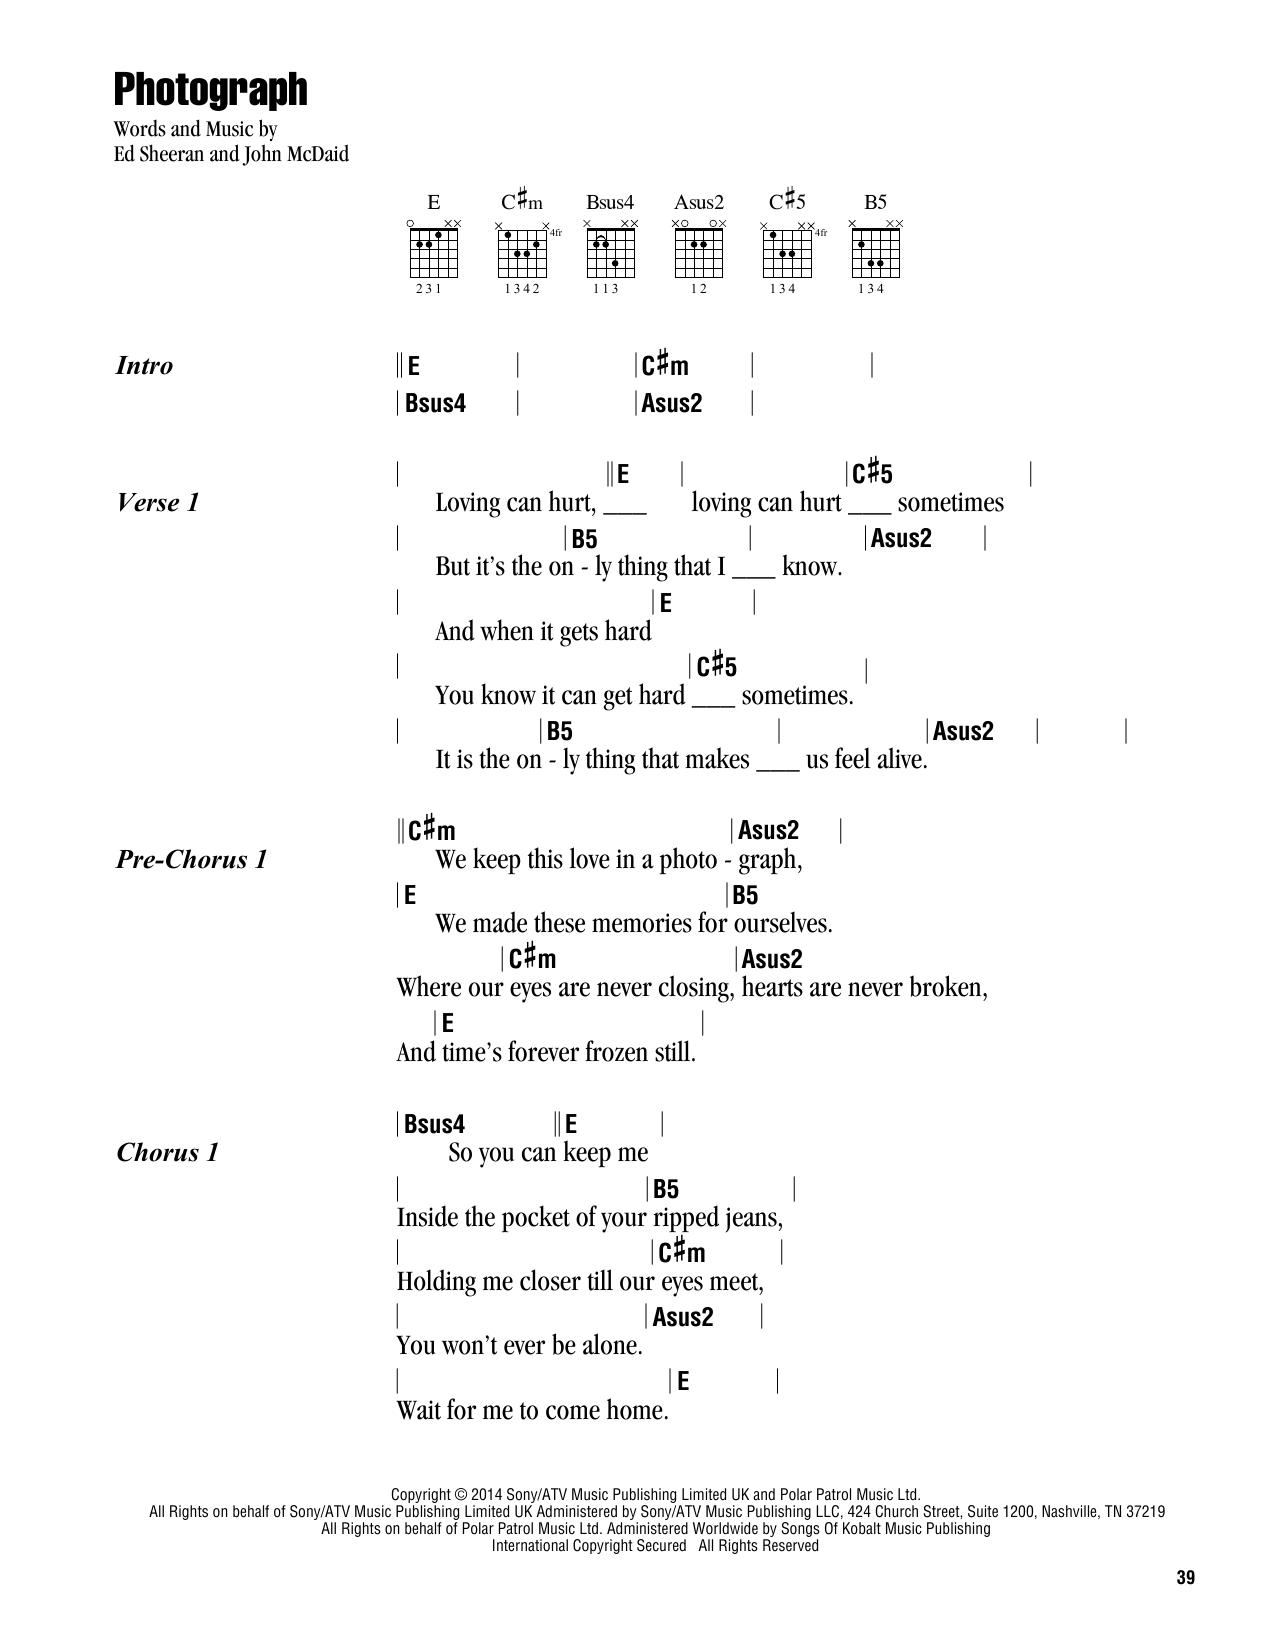 Photograph sheet music by Ed Sheeran Lyrics  Chords